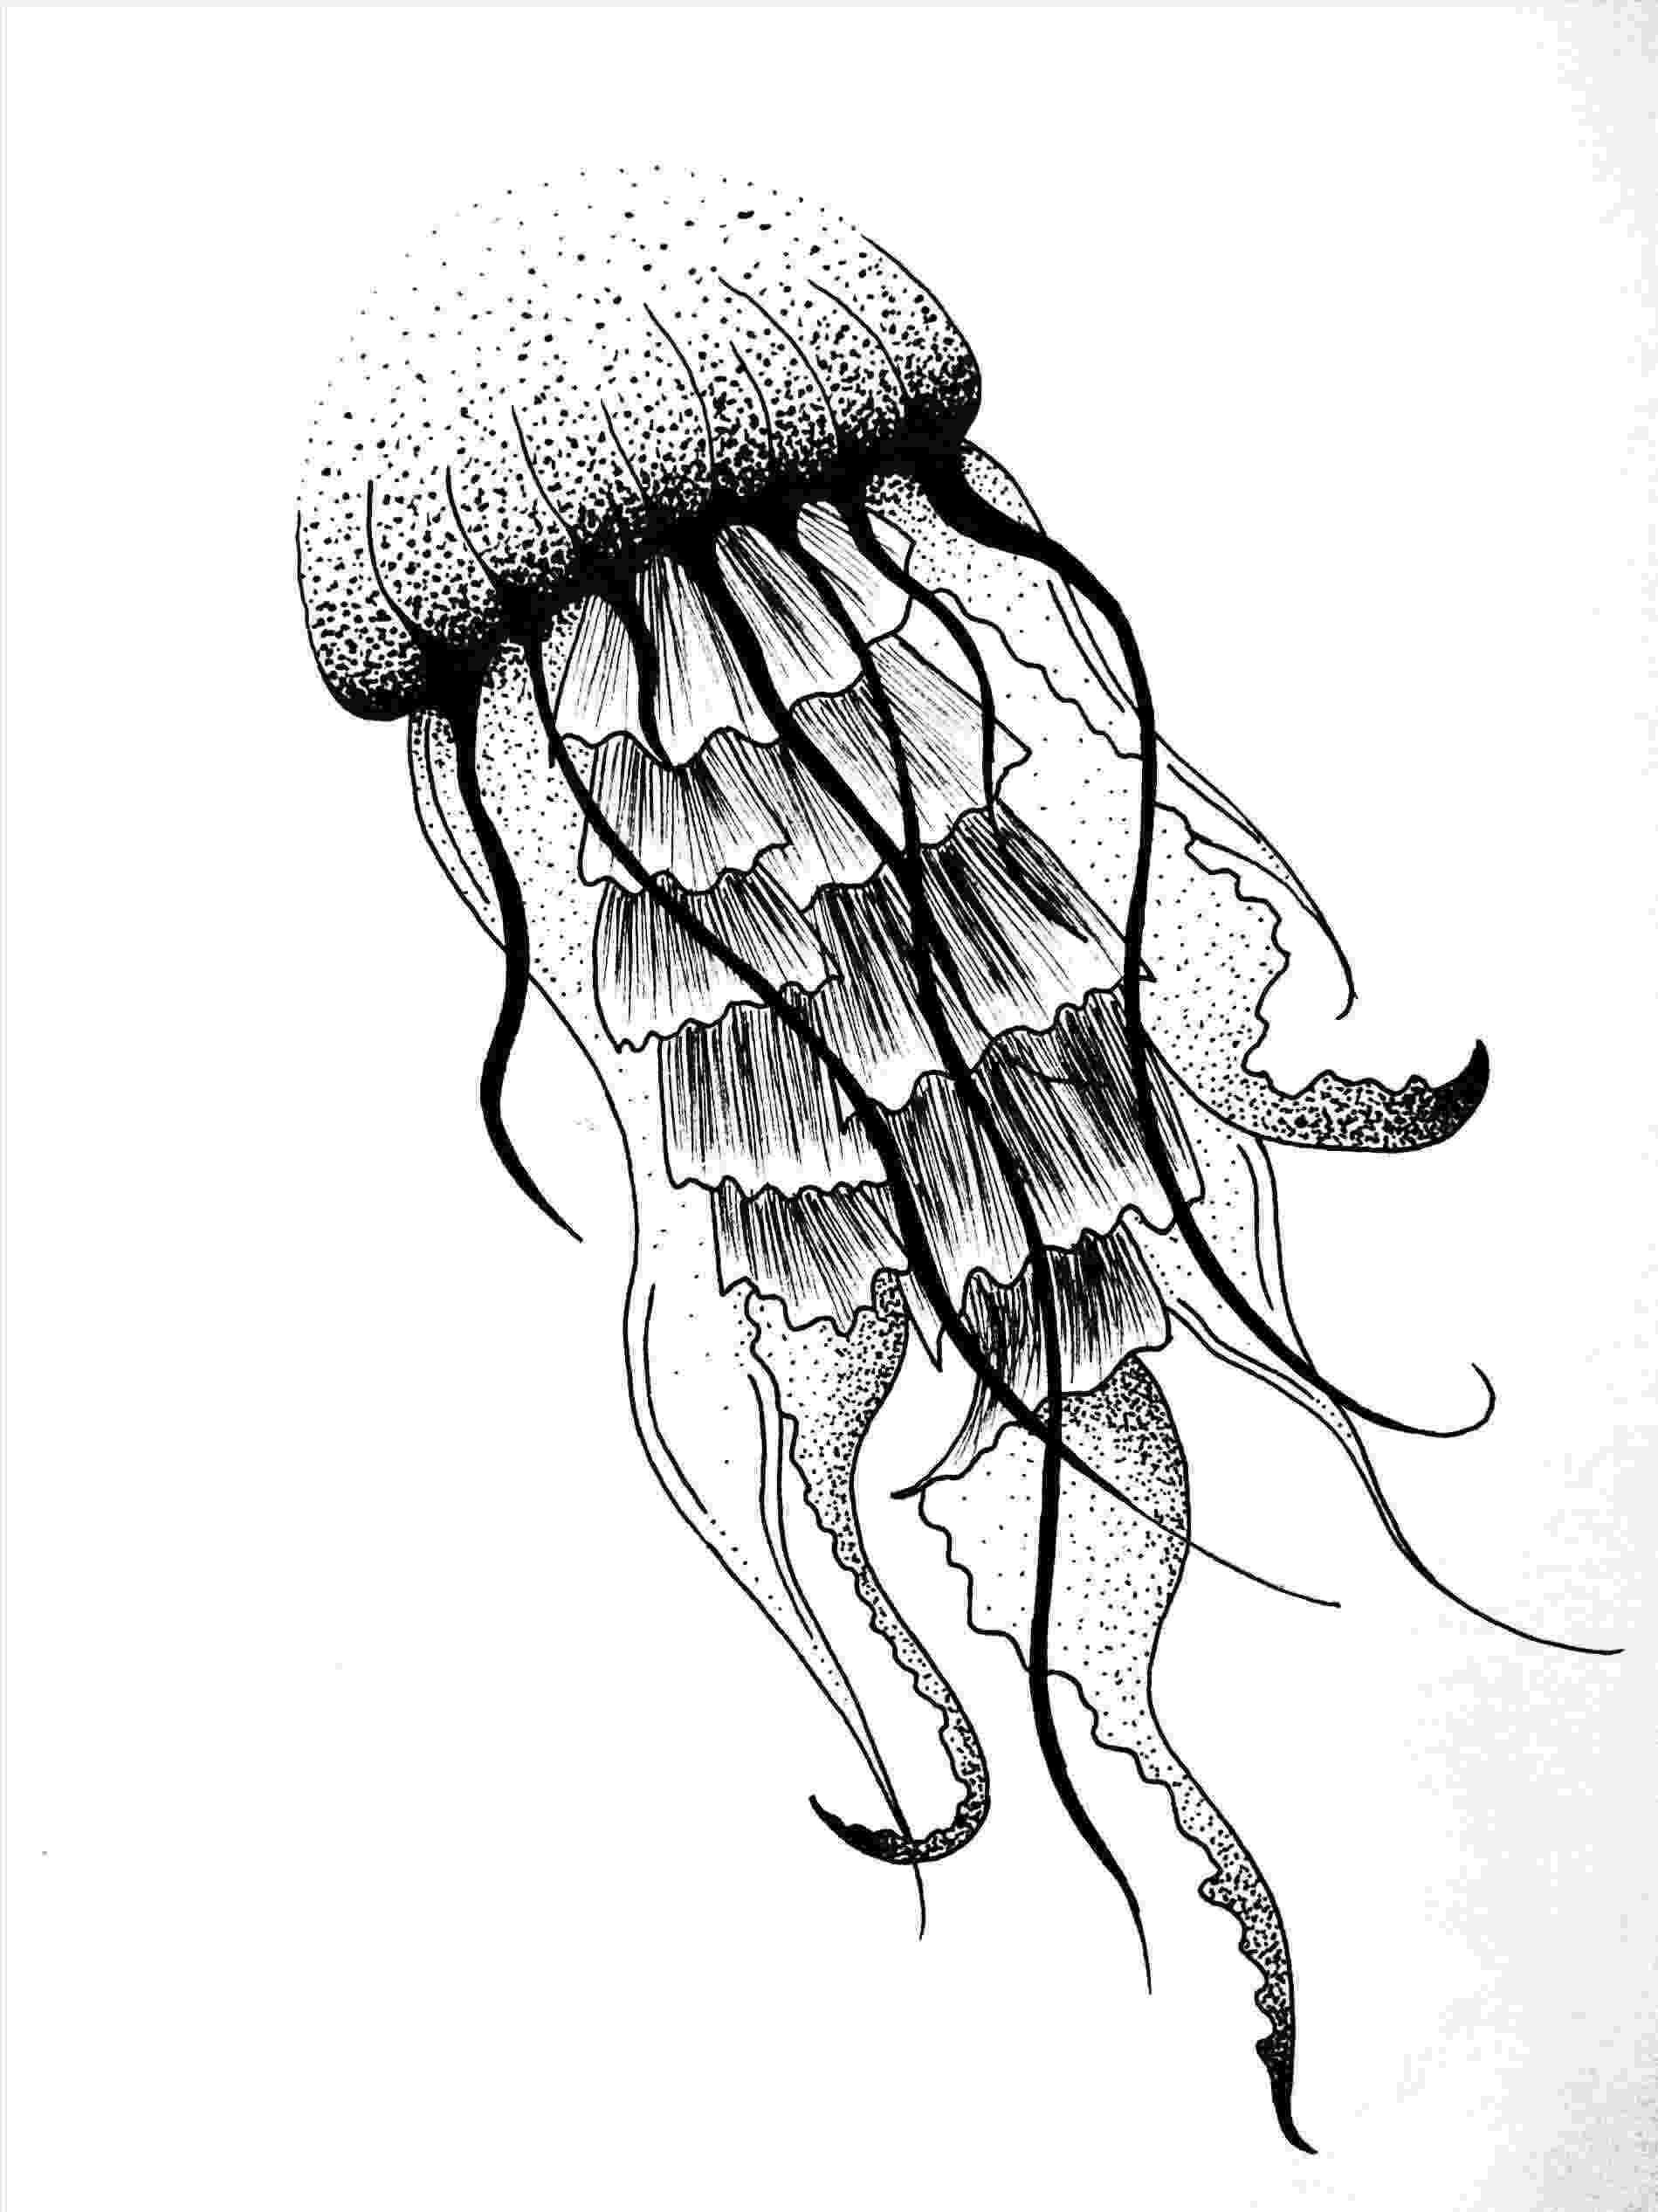 jellyfish sketch jellyfish by candykilljoy on deviantart tattoo ideas sketch jellyfish